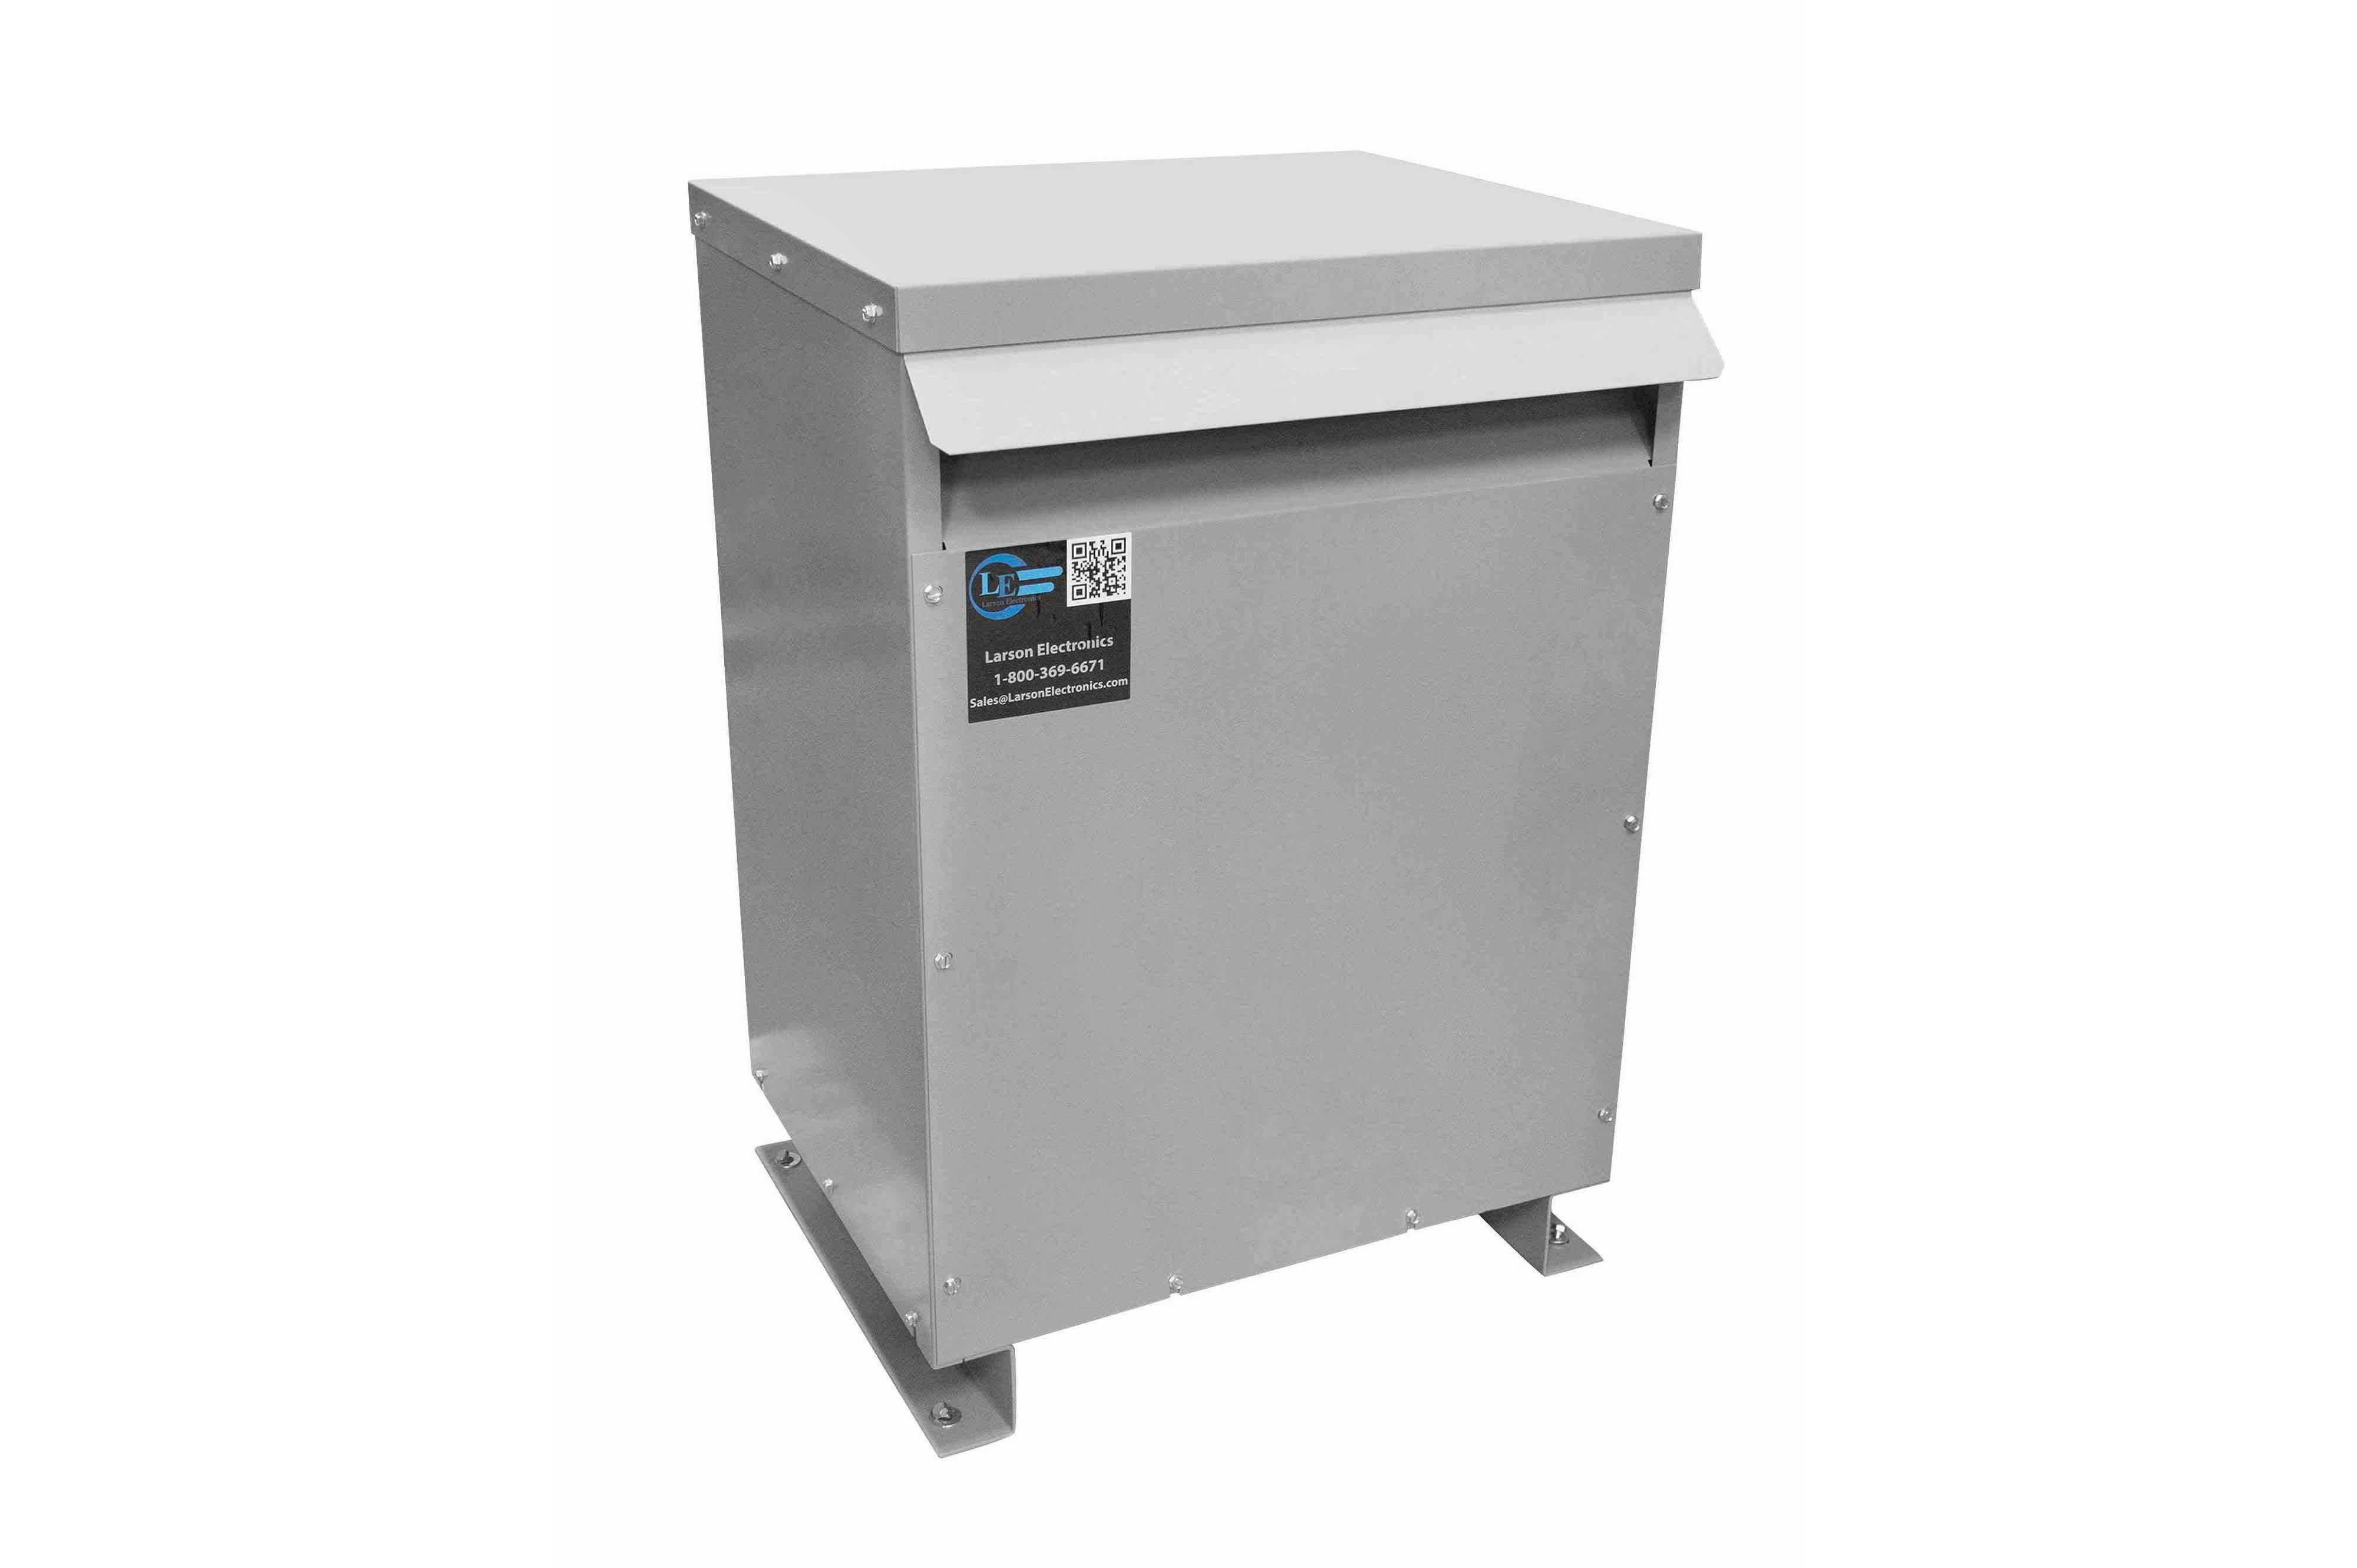 900 kVA 3PH Isolation Transformer, 400V Wye Primary, 480V Delta Secondary, N3R, Ventilated, 60 Hz